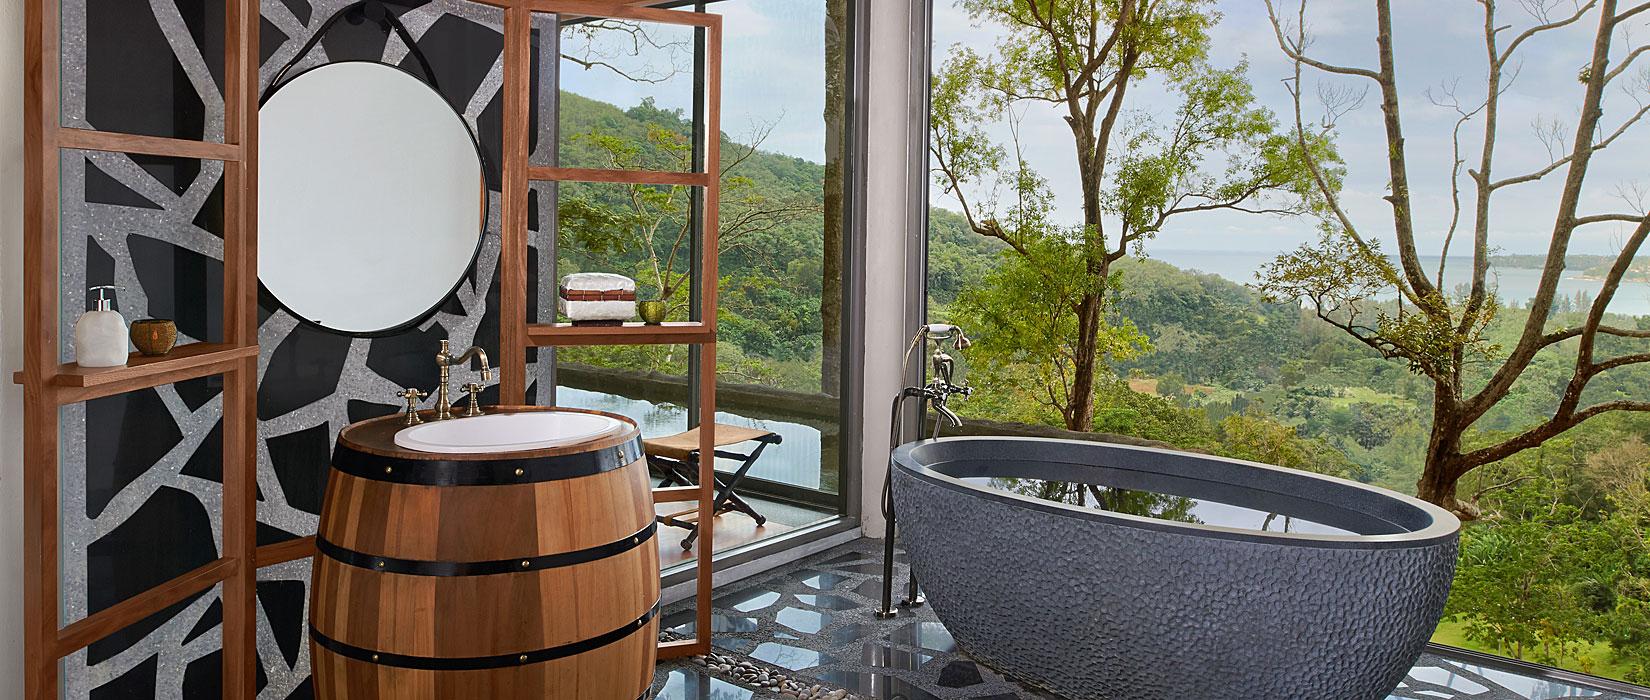 Phuket Villas   Keemala   Luxury Villas Kamala pour Pool House 10M2